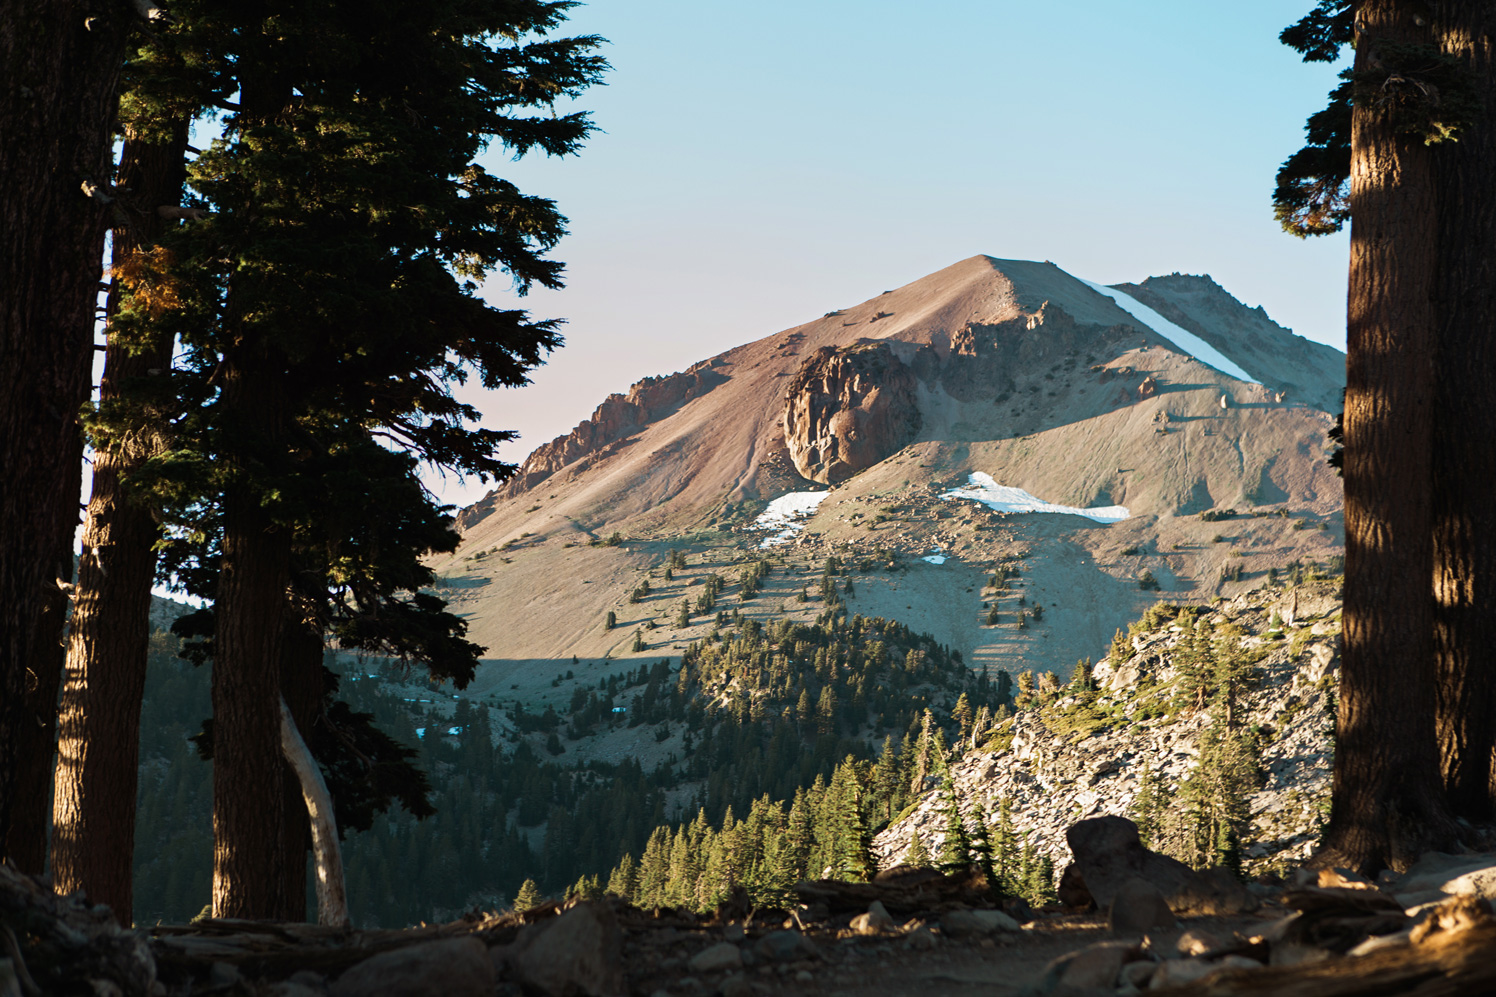 CindyGiovagnoli_Lassen_Volcanic_National_Park_California_camp_road_trip-020.jpg